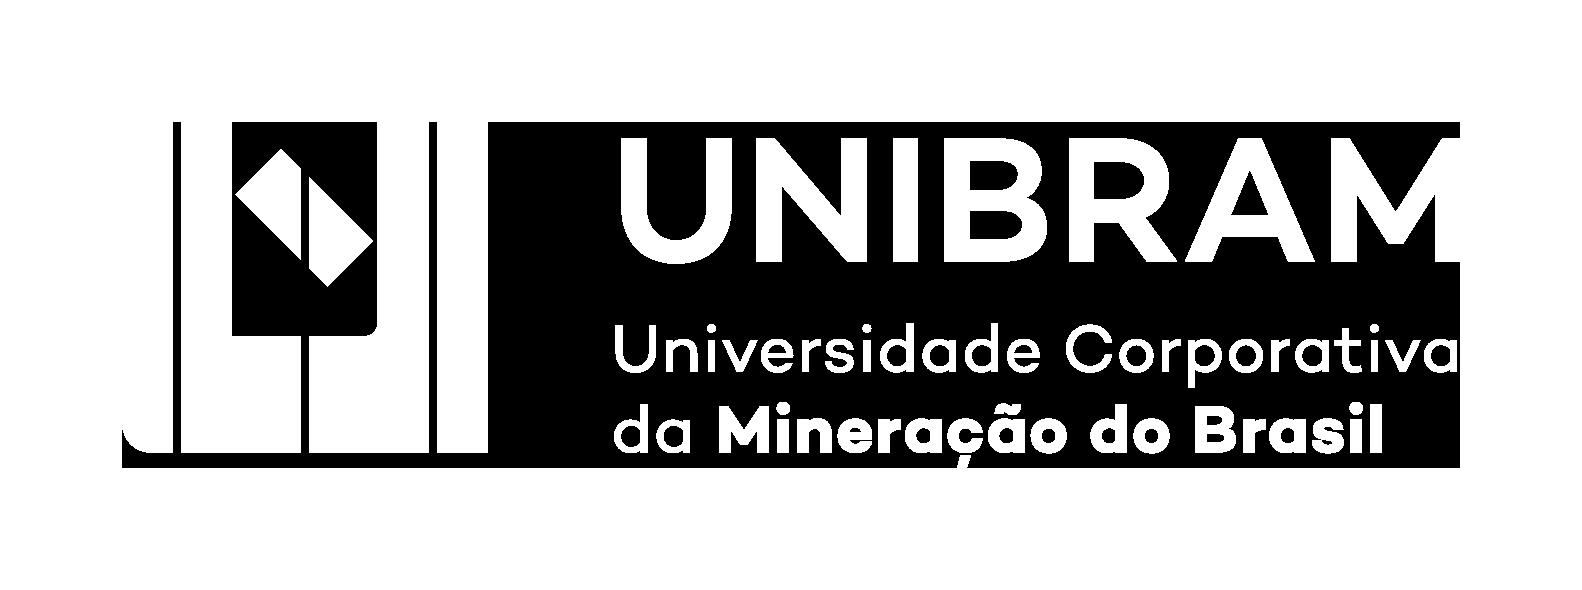 Logo Unibram